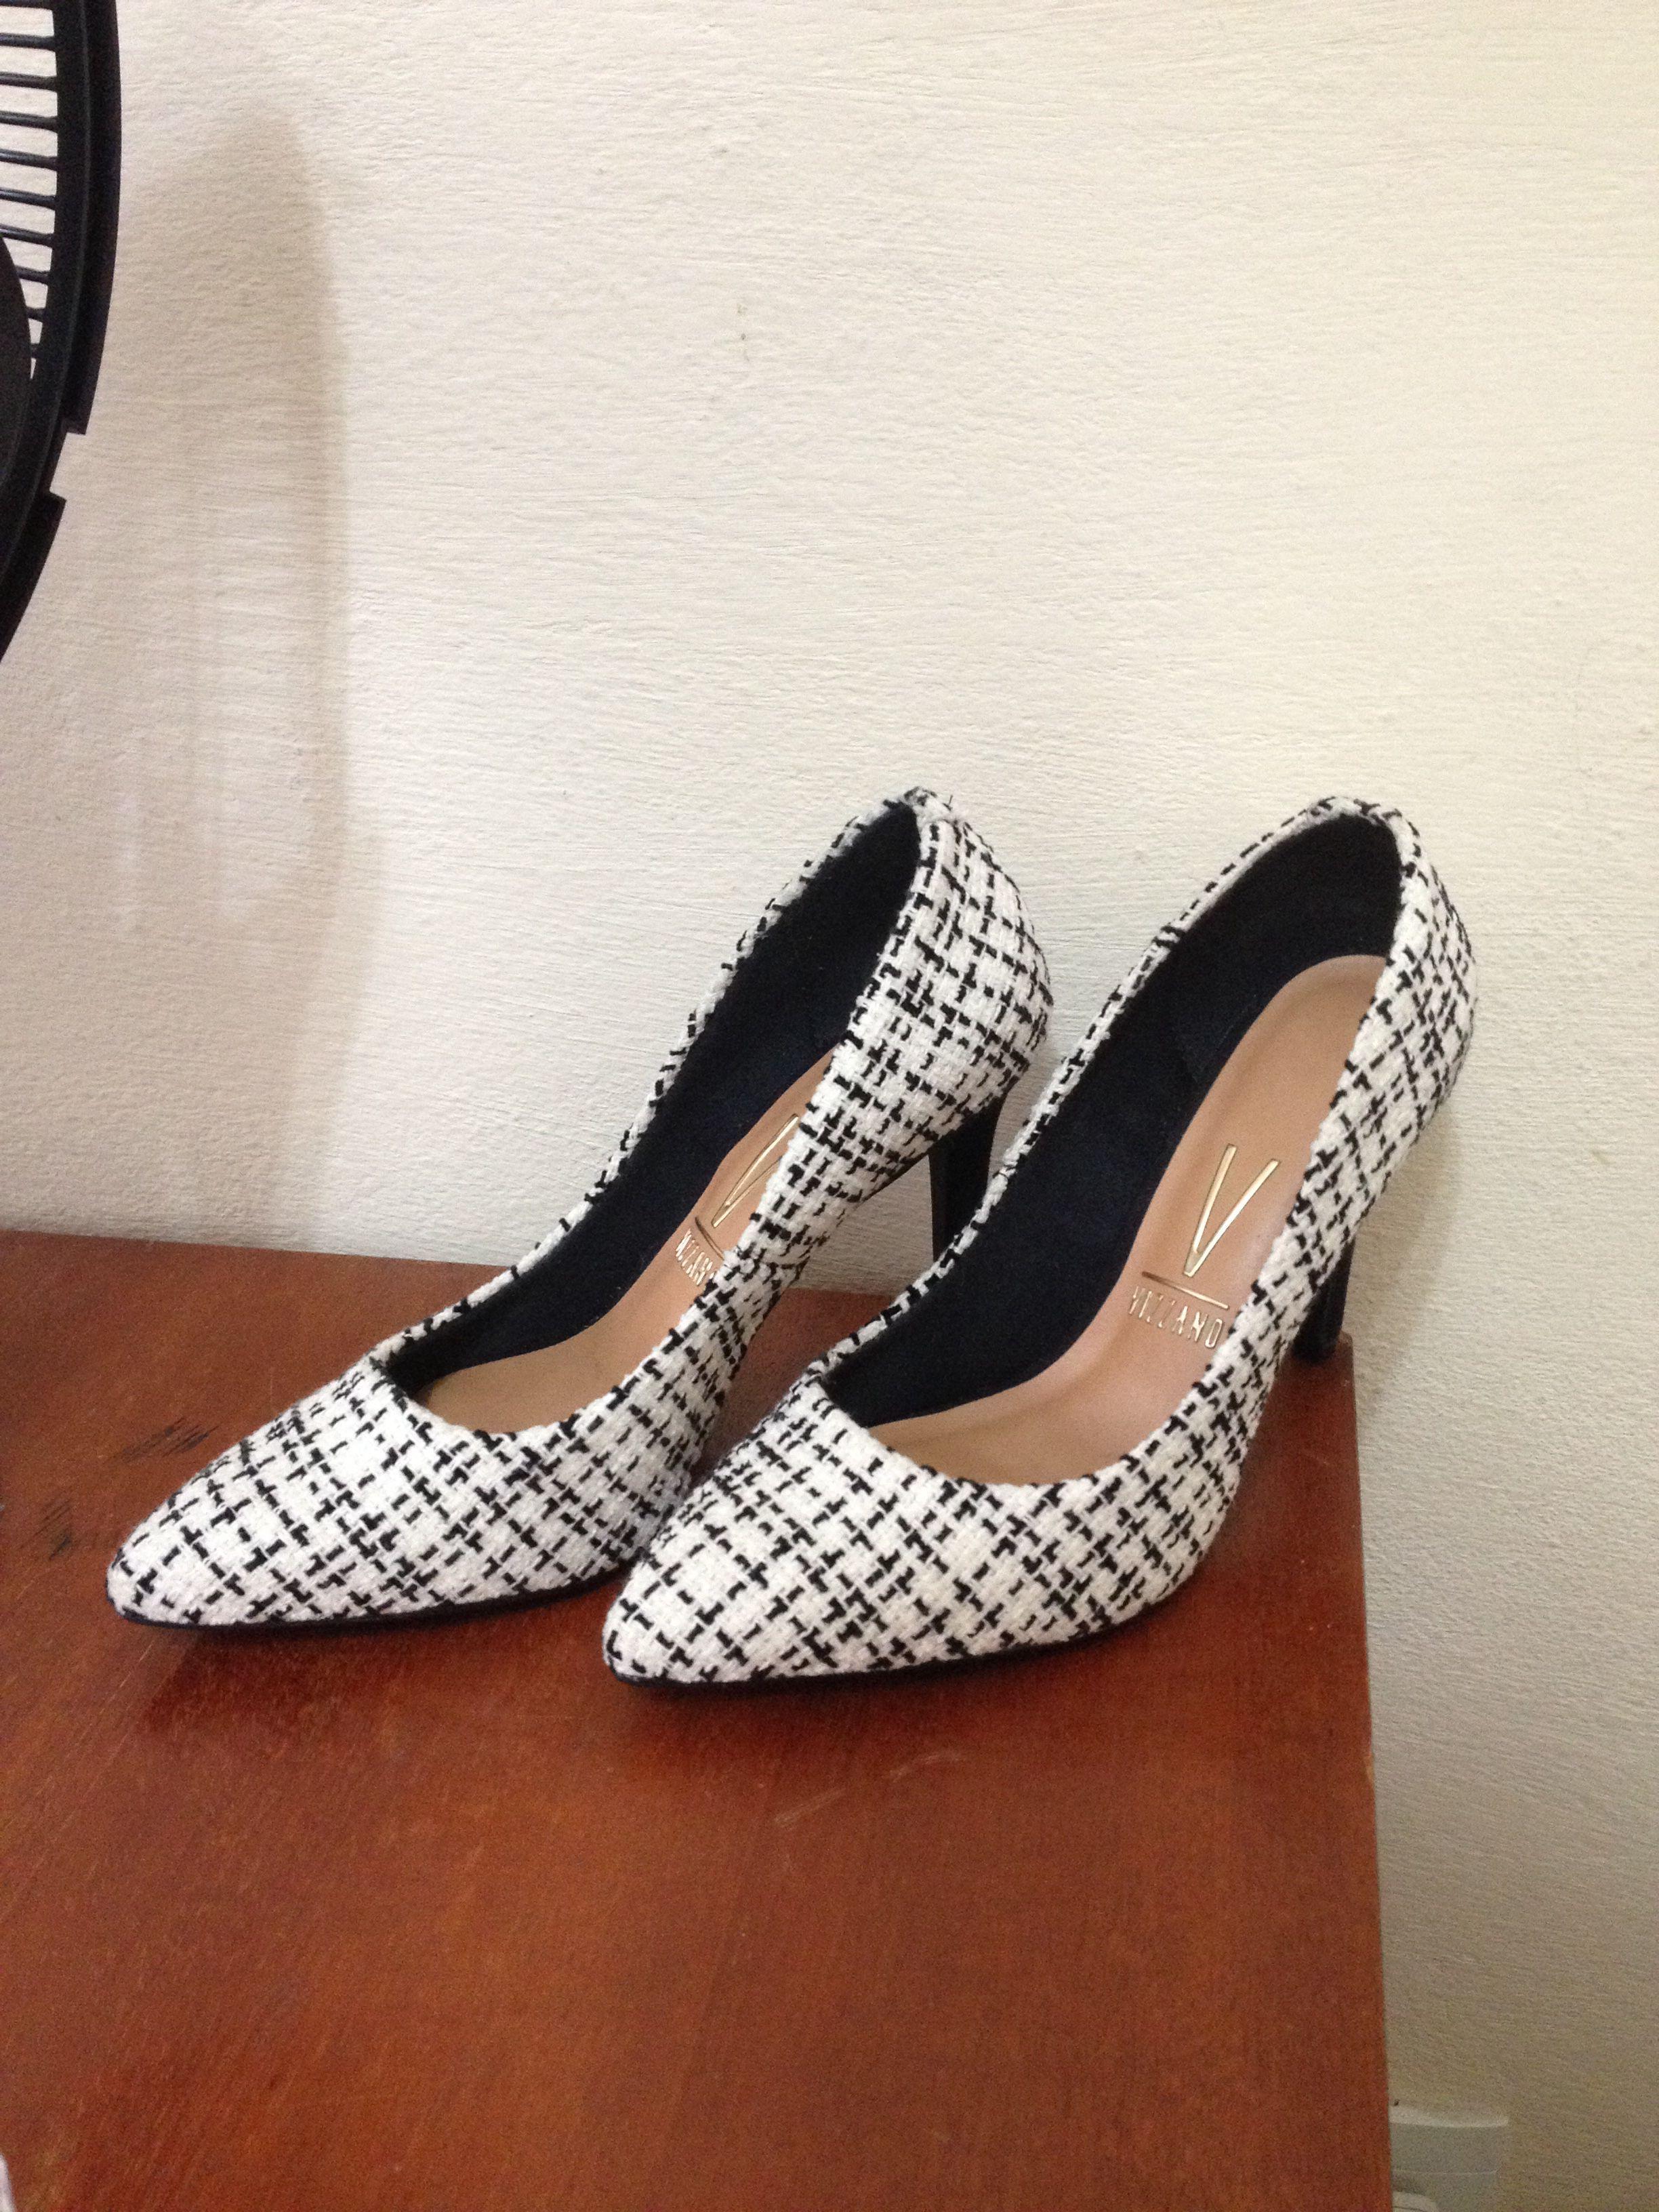 Shoes by Vizzano; Sapatos by Vizzano; Zapatos by Vizzano.